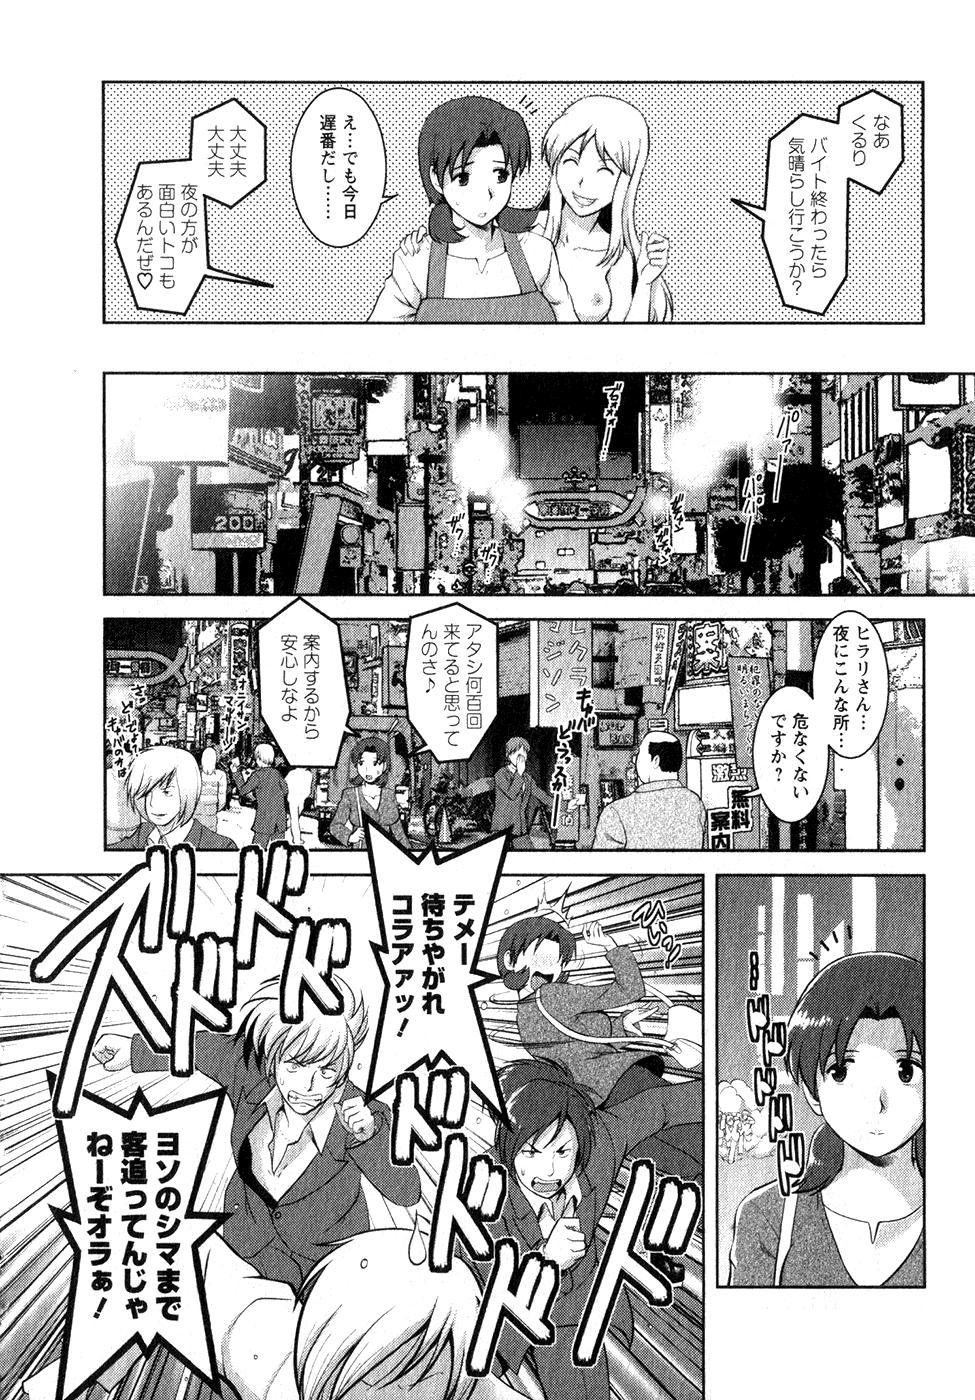 [Saigado] Kururi-san to Hirari-san Vol. 1 (Complete) 92